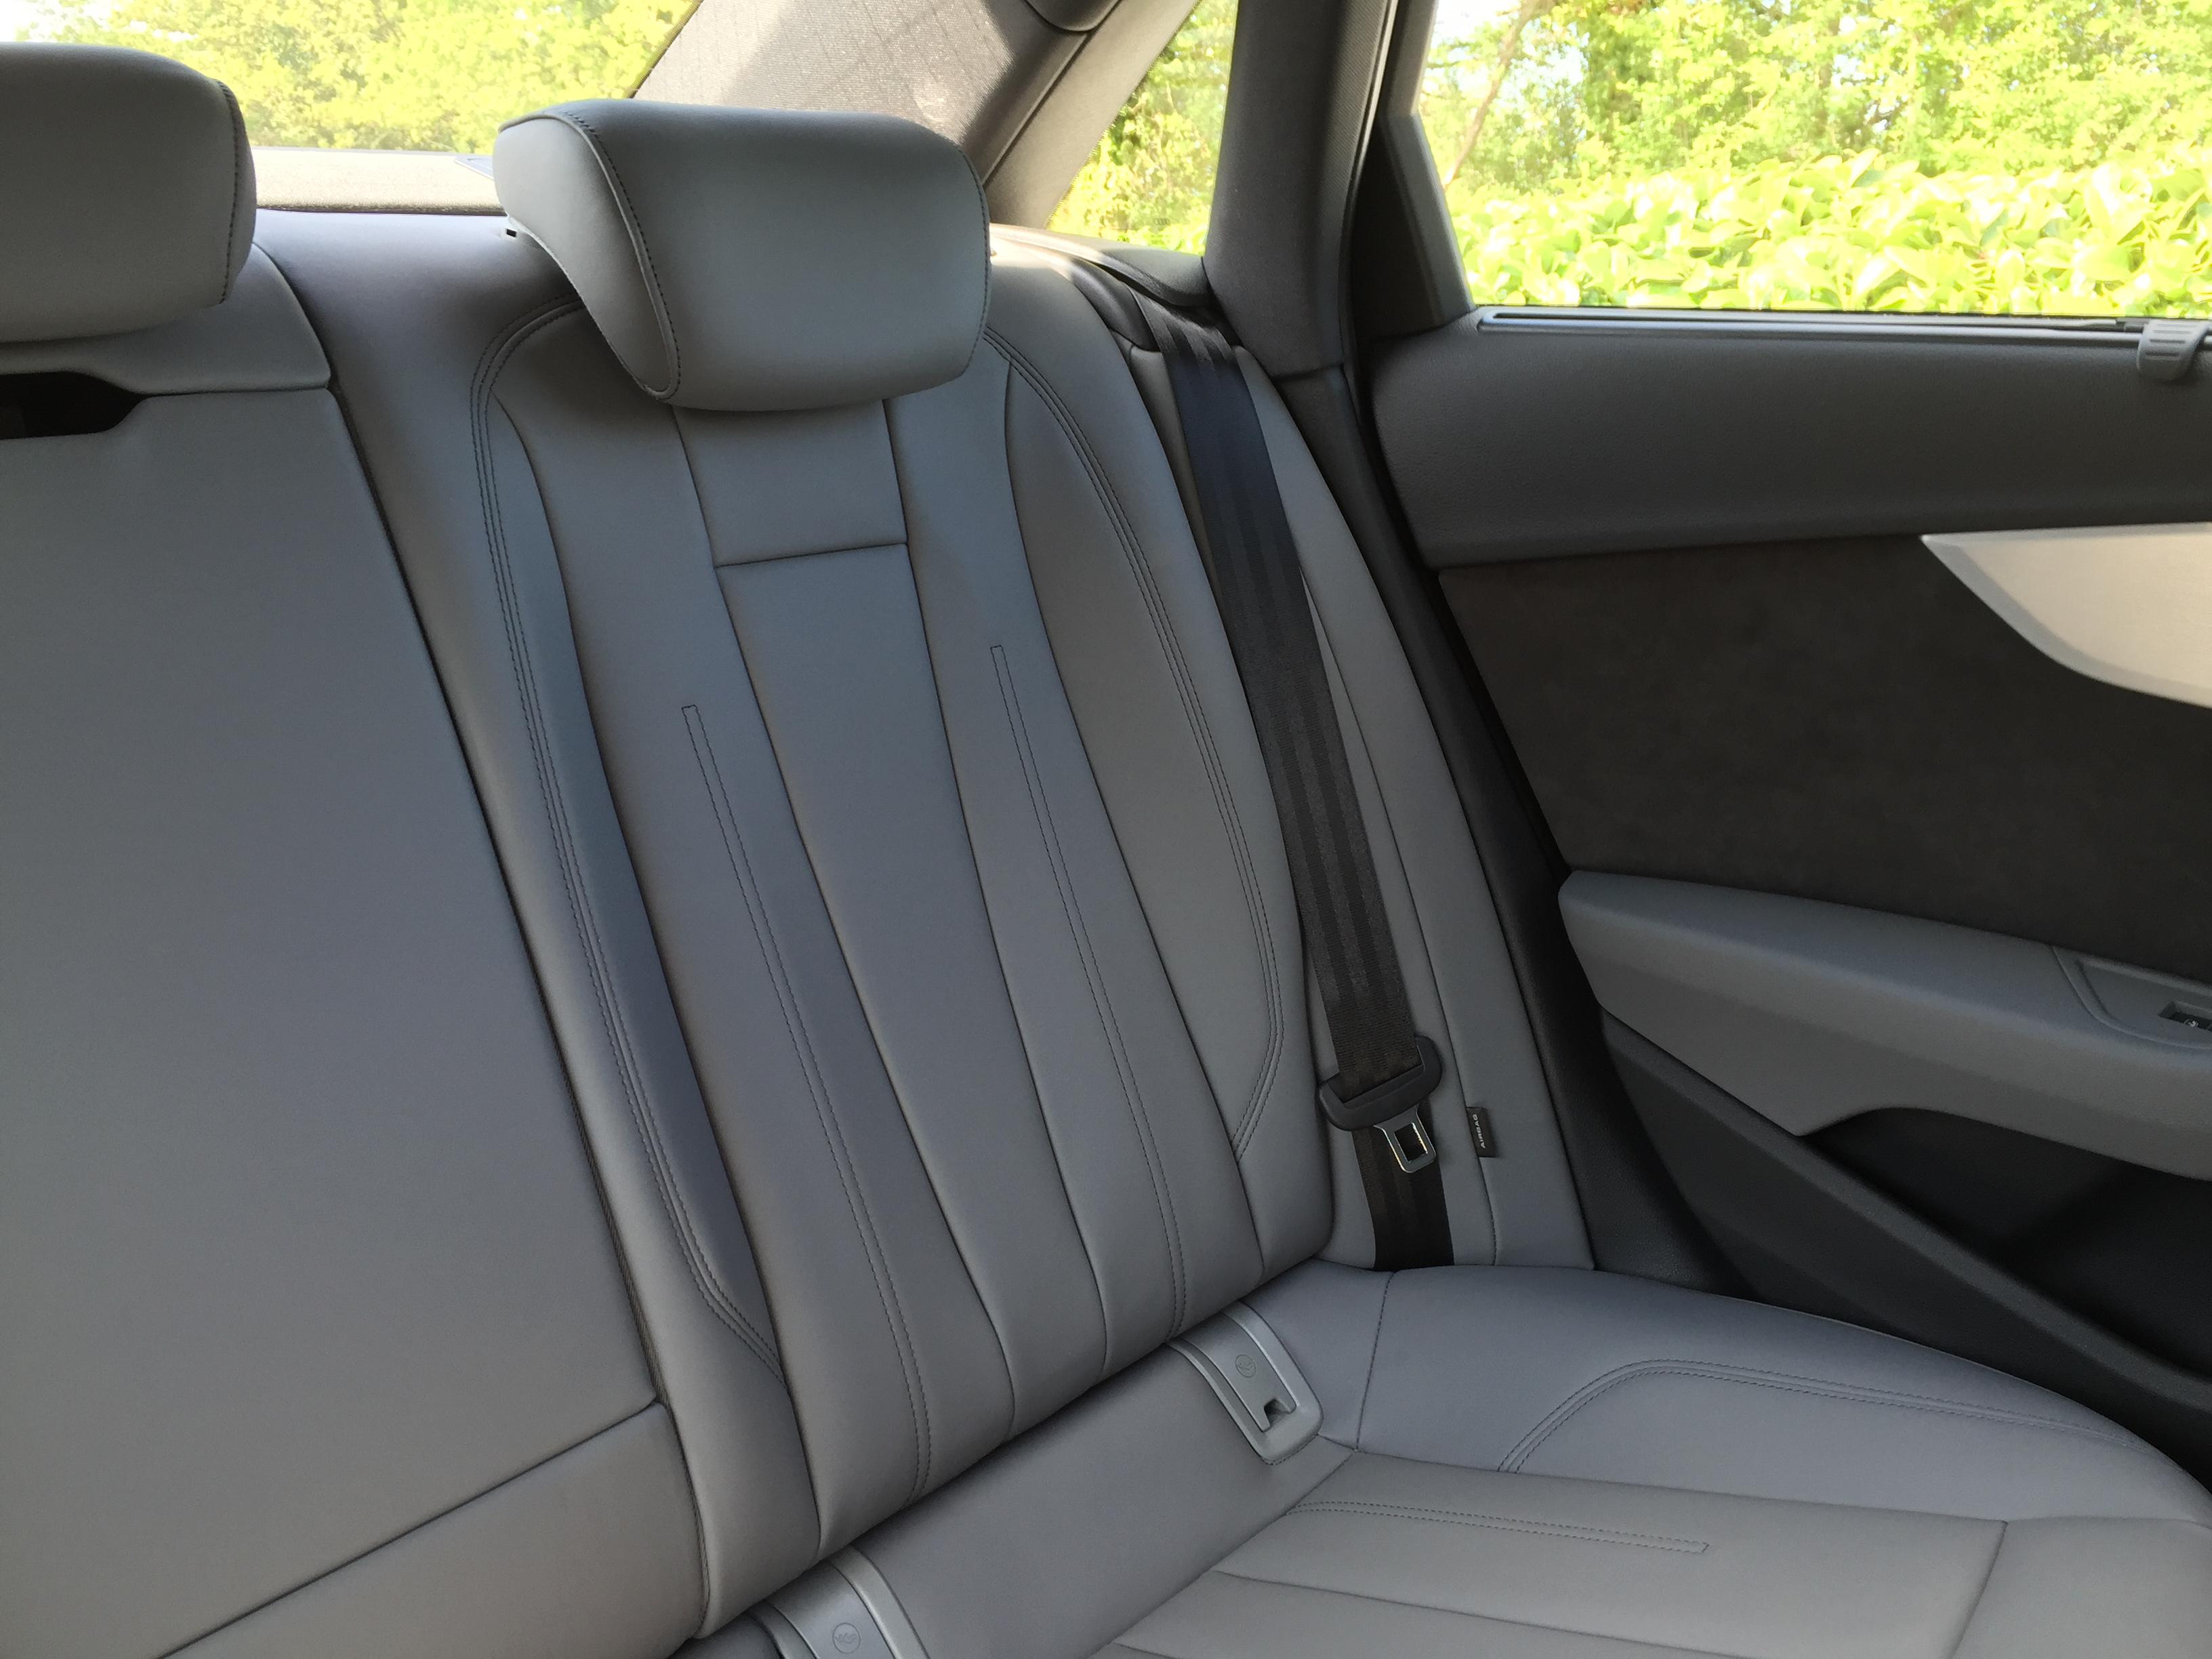 2016 Audi Q5 >> Rotor grey anyone? | Audi-Sport.net